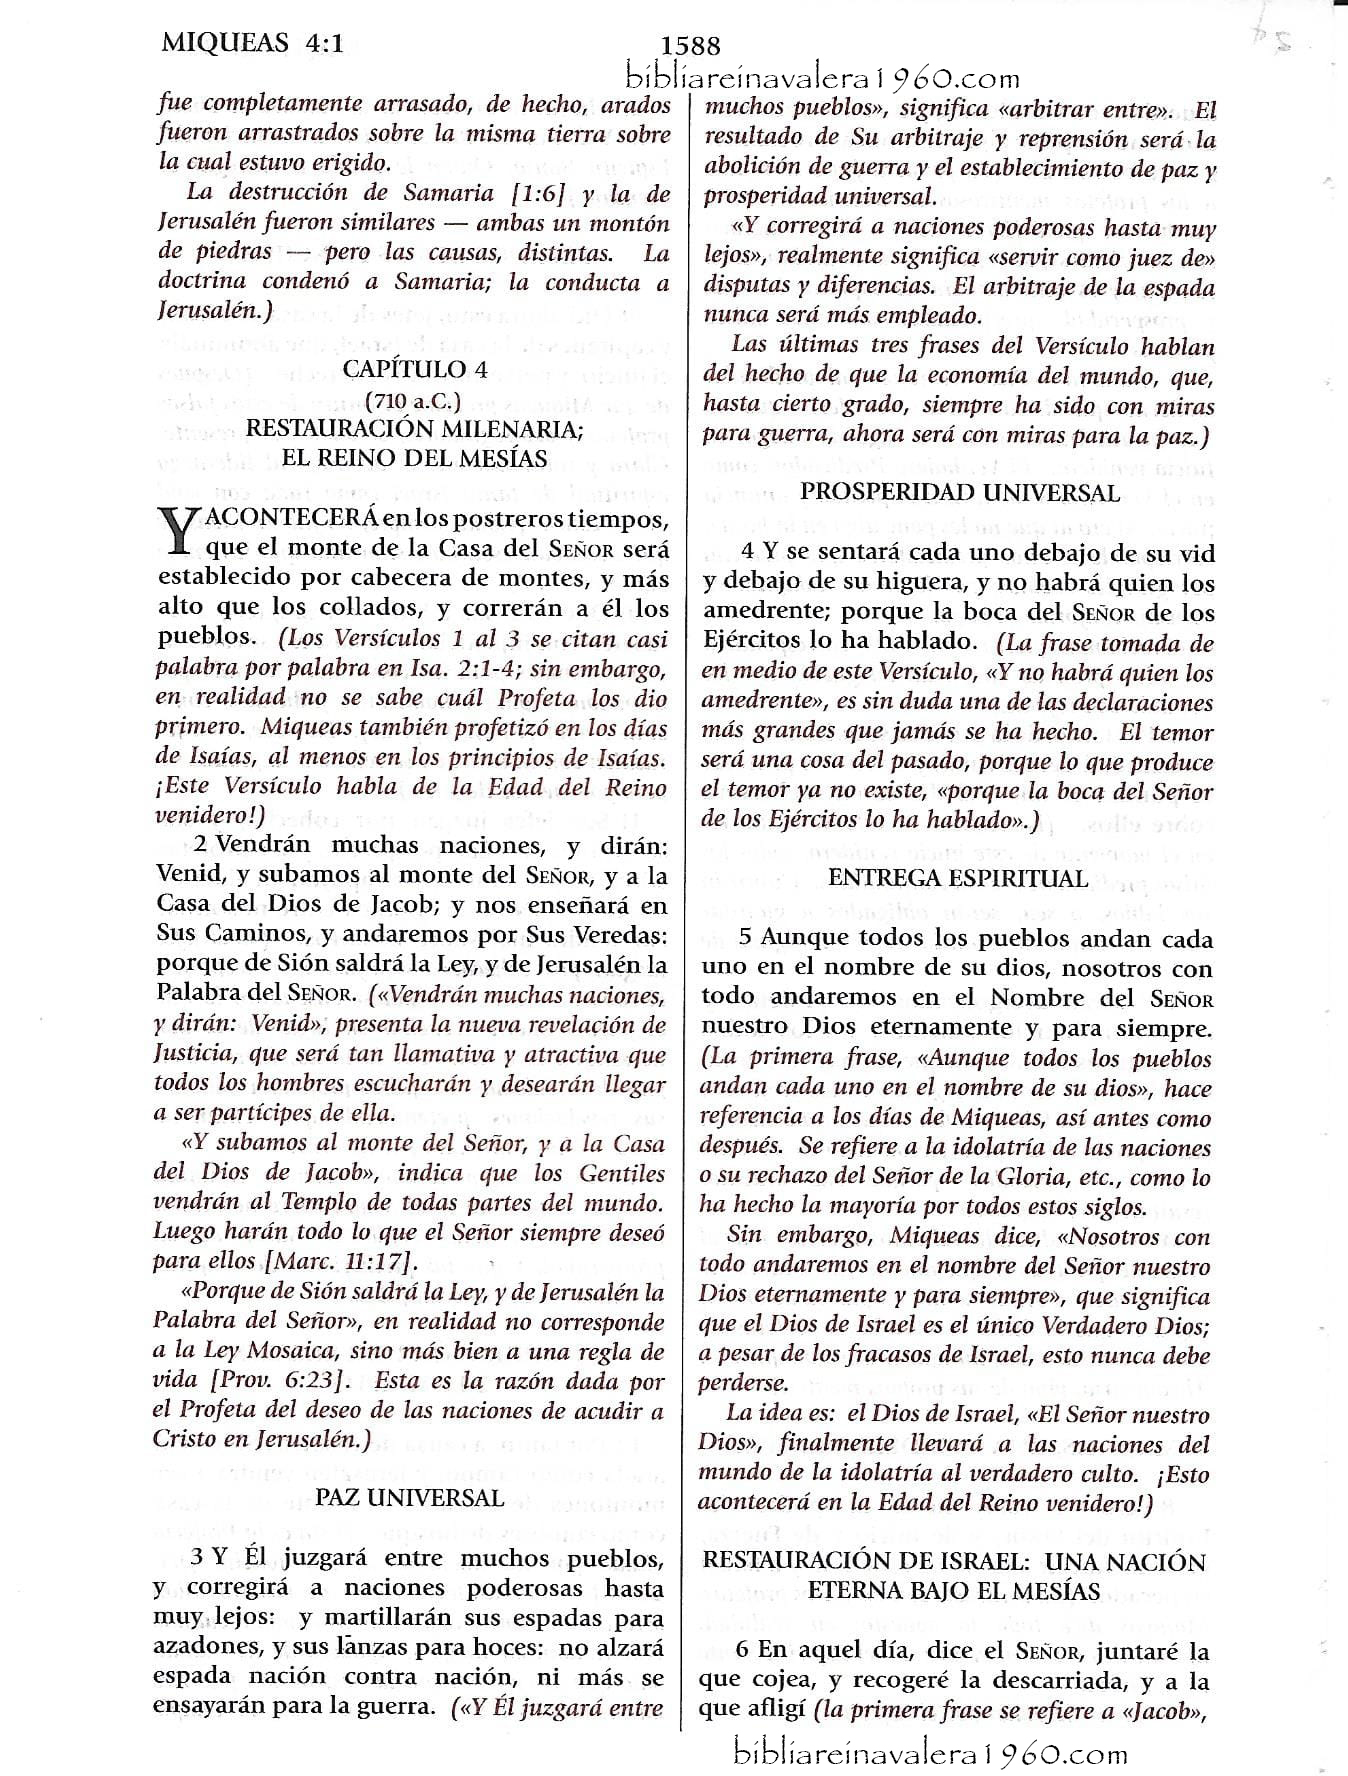 miqueas 3 explicacion 1588